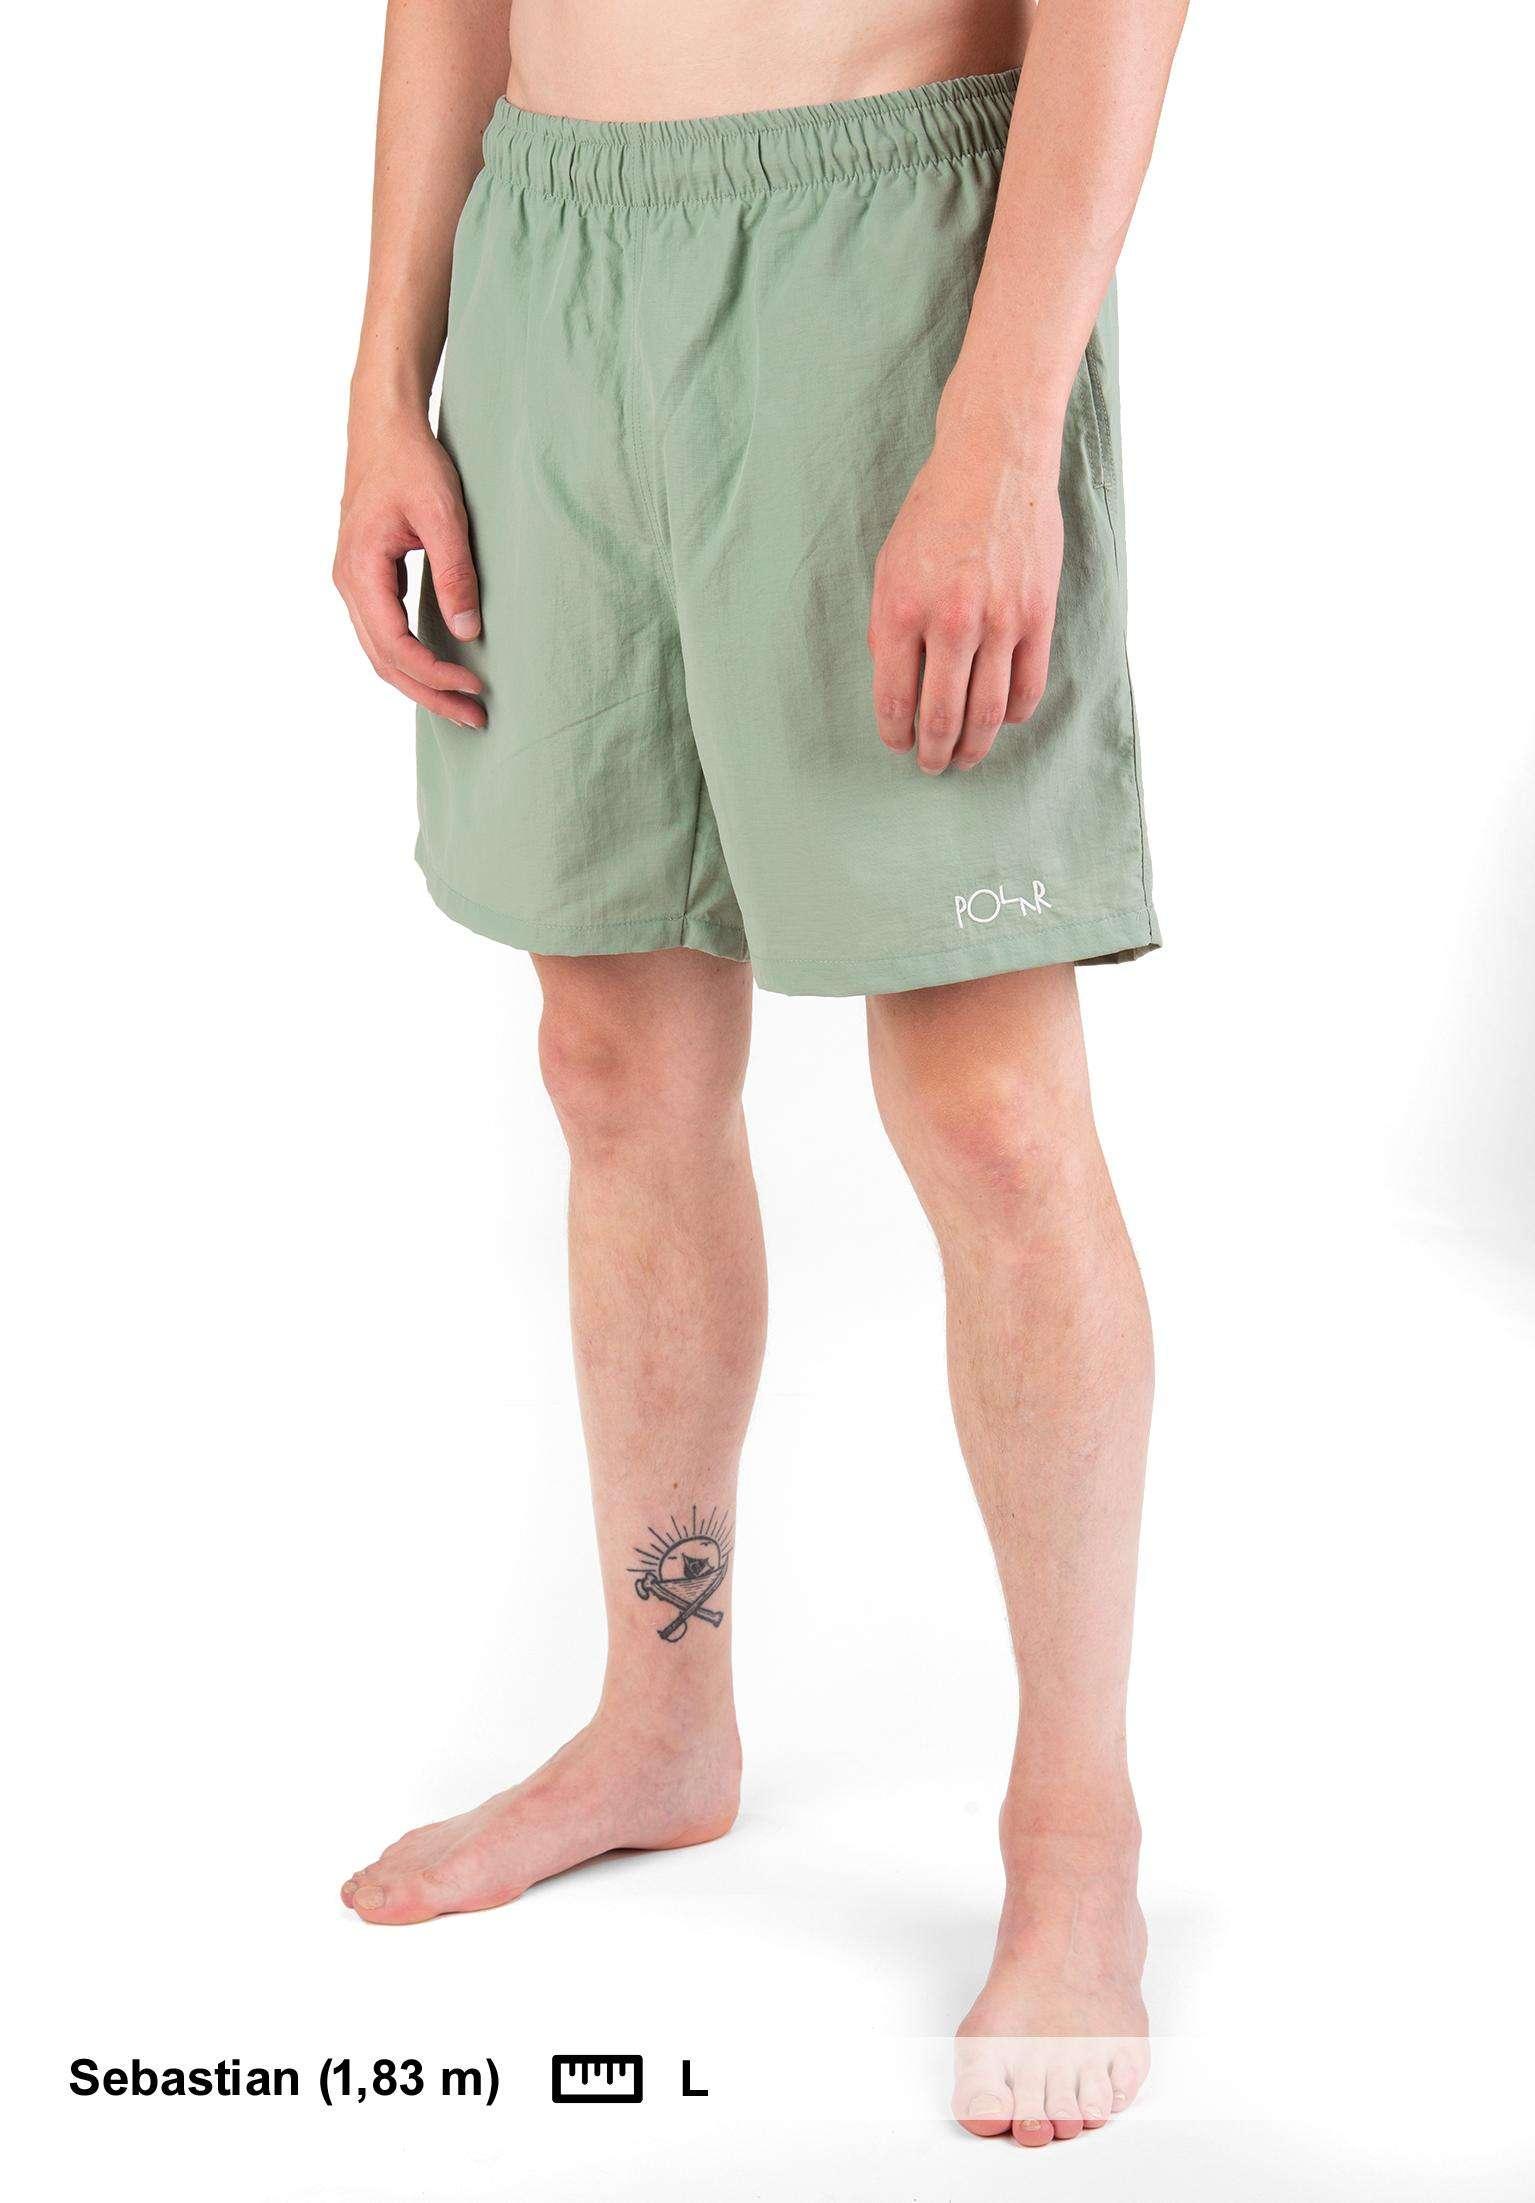 69afb266abb75 Swim Shorts Polar Skate Co Beachwear in seafoamgreen for Men | Titus